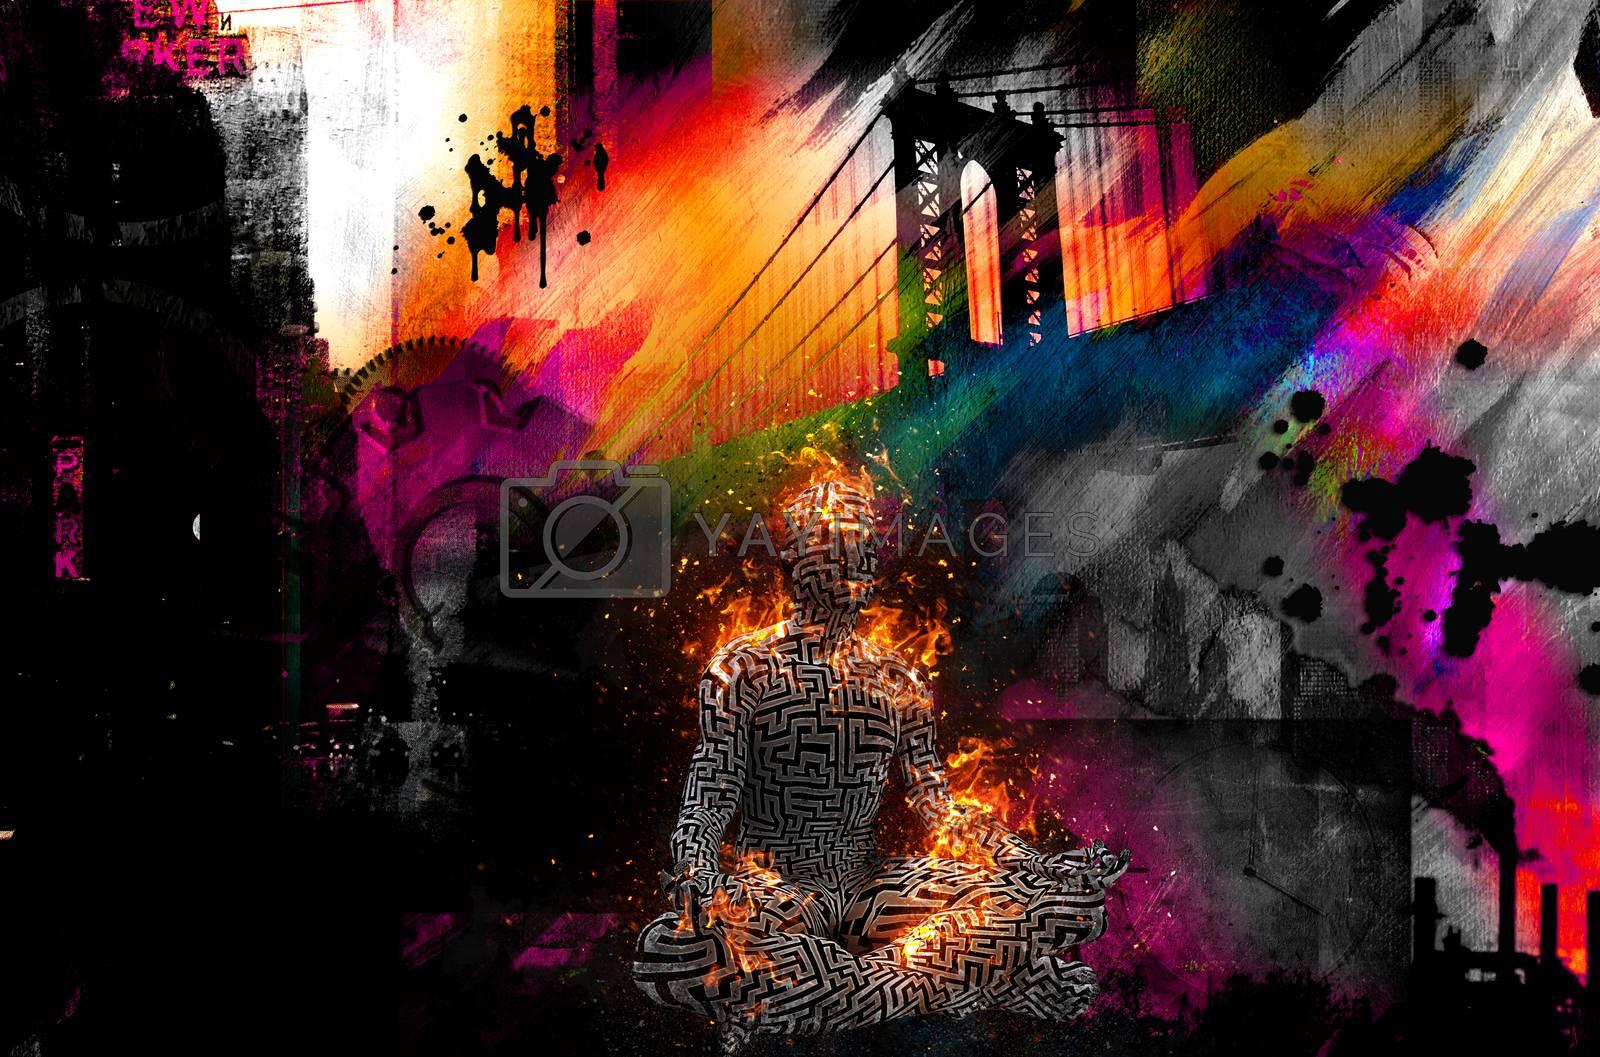 Colorful painting. Manhattan bridge. Burning figure of man in lotus pose. 3D rendering